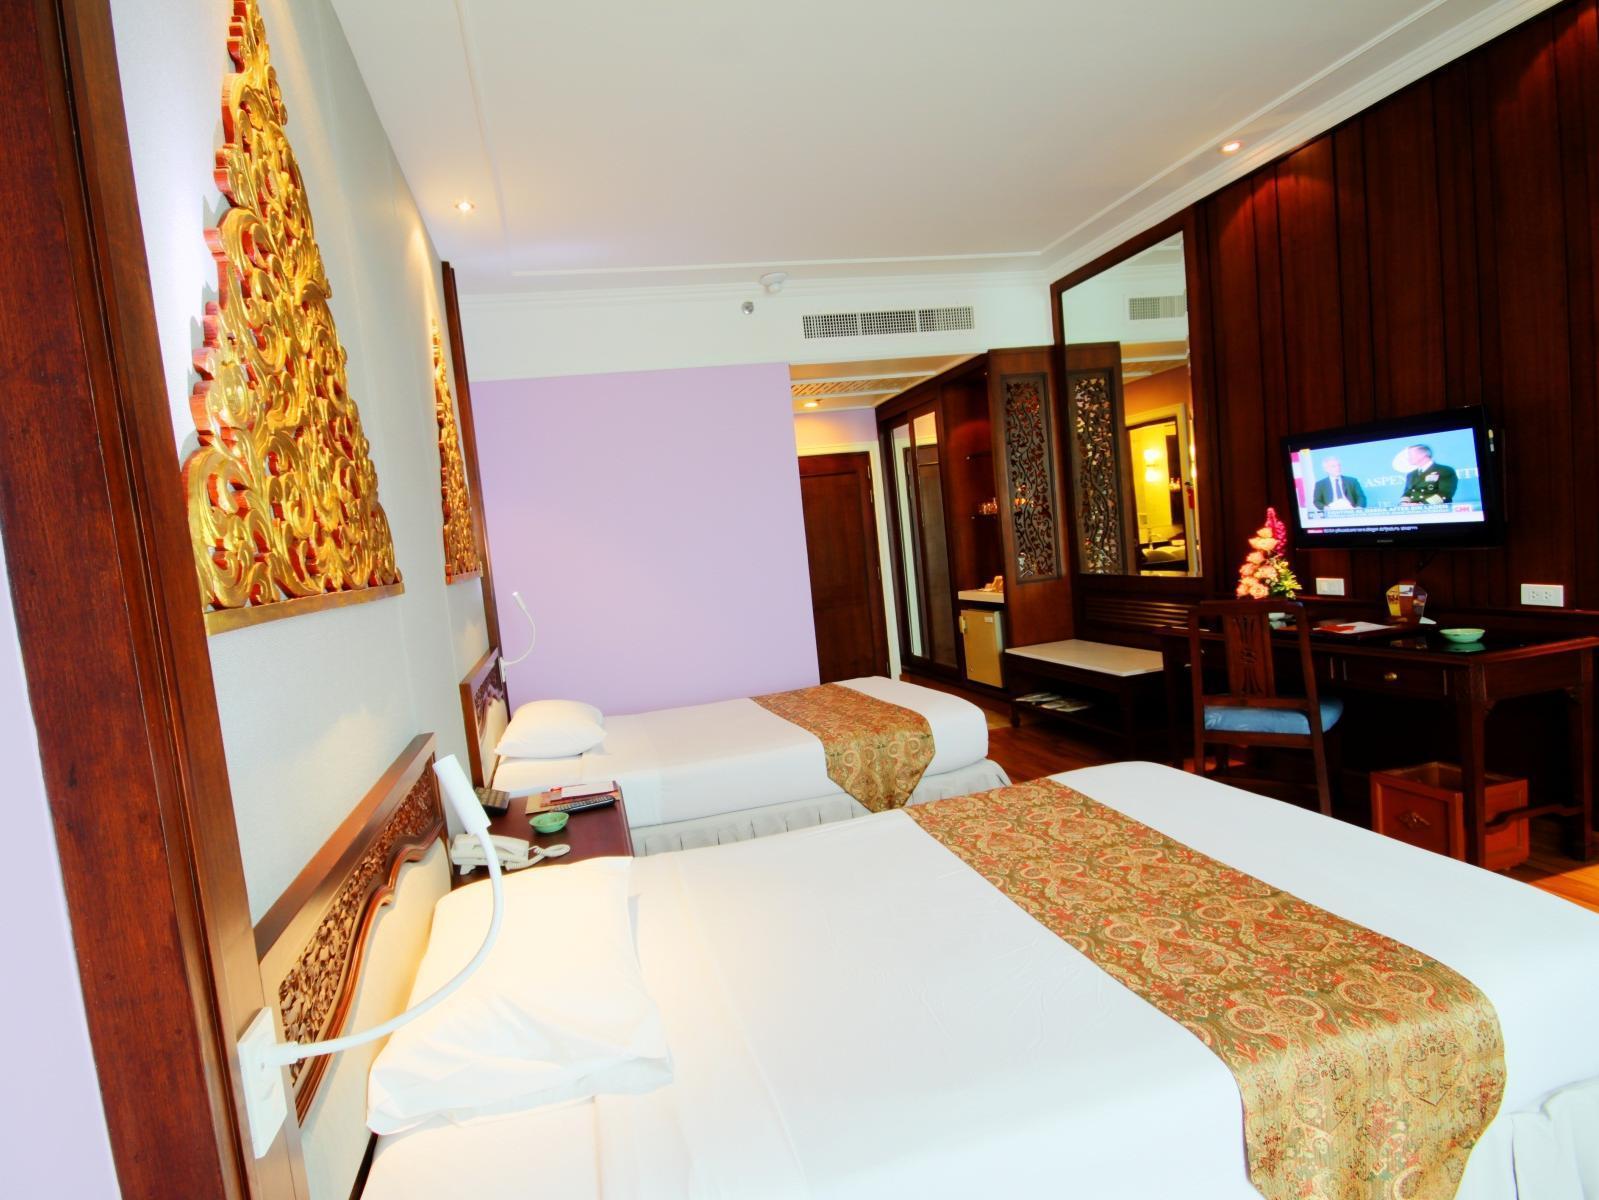 Empress Hotel โรงแรมเอ็มเพรส